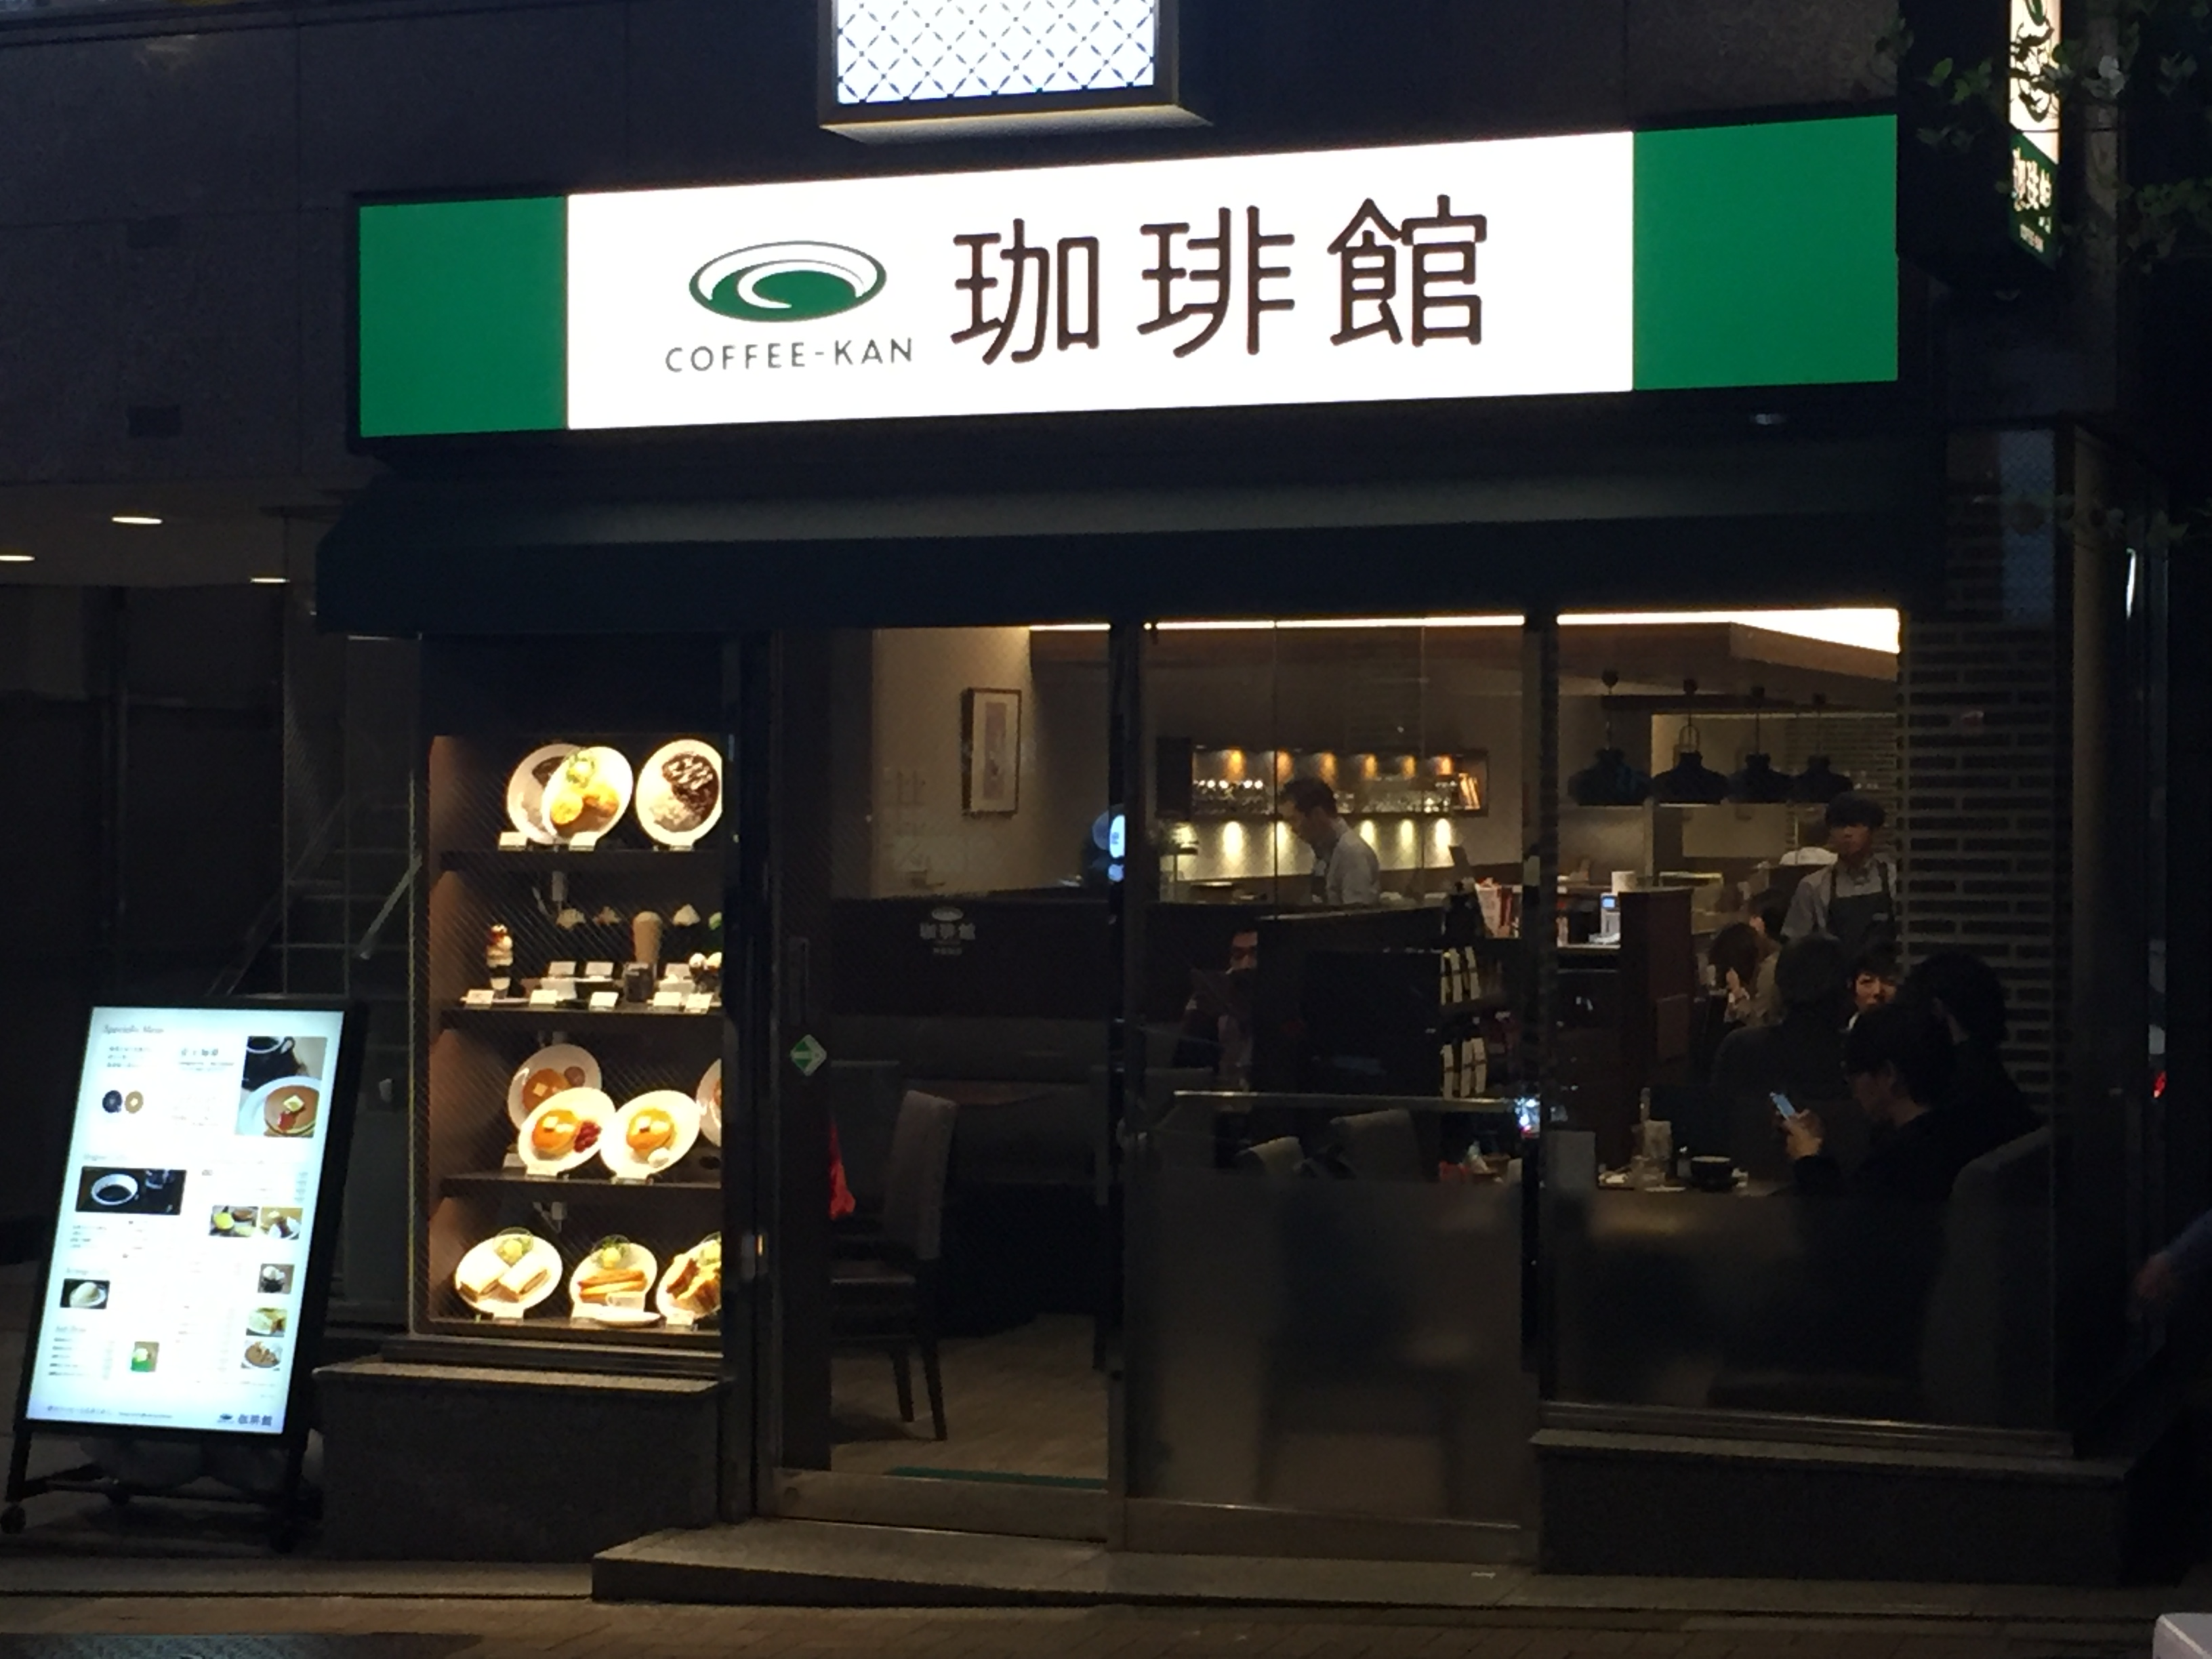 神楽坂駅 電源カフェ 珈琲館神楽坂店